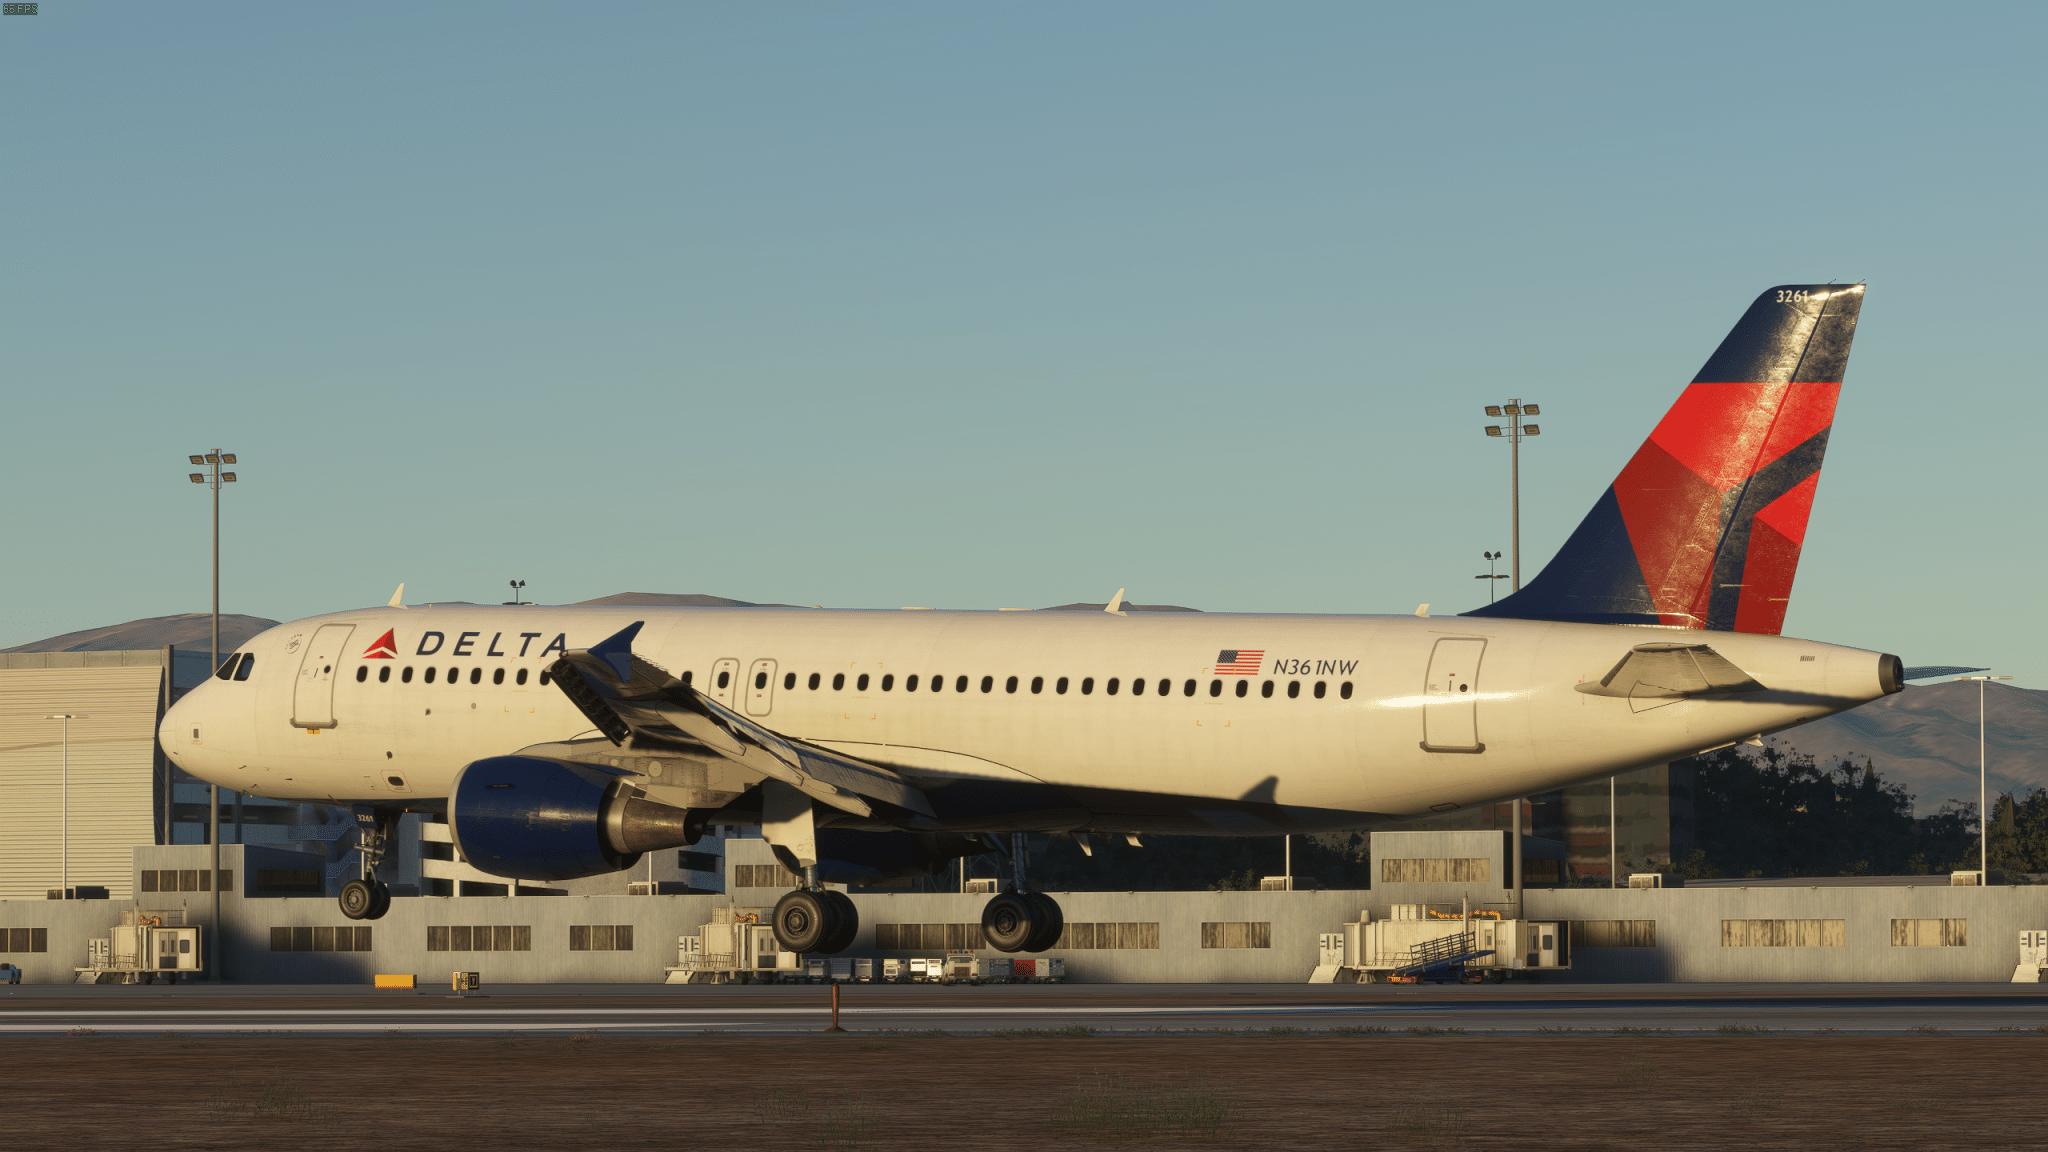 Microsoft-Flight-Simulator-Screenshot-2021.02.11-17.56.58.56-2048x1152